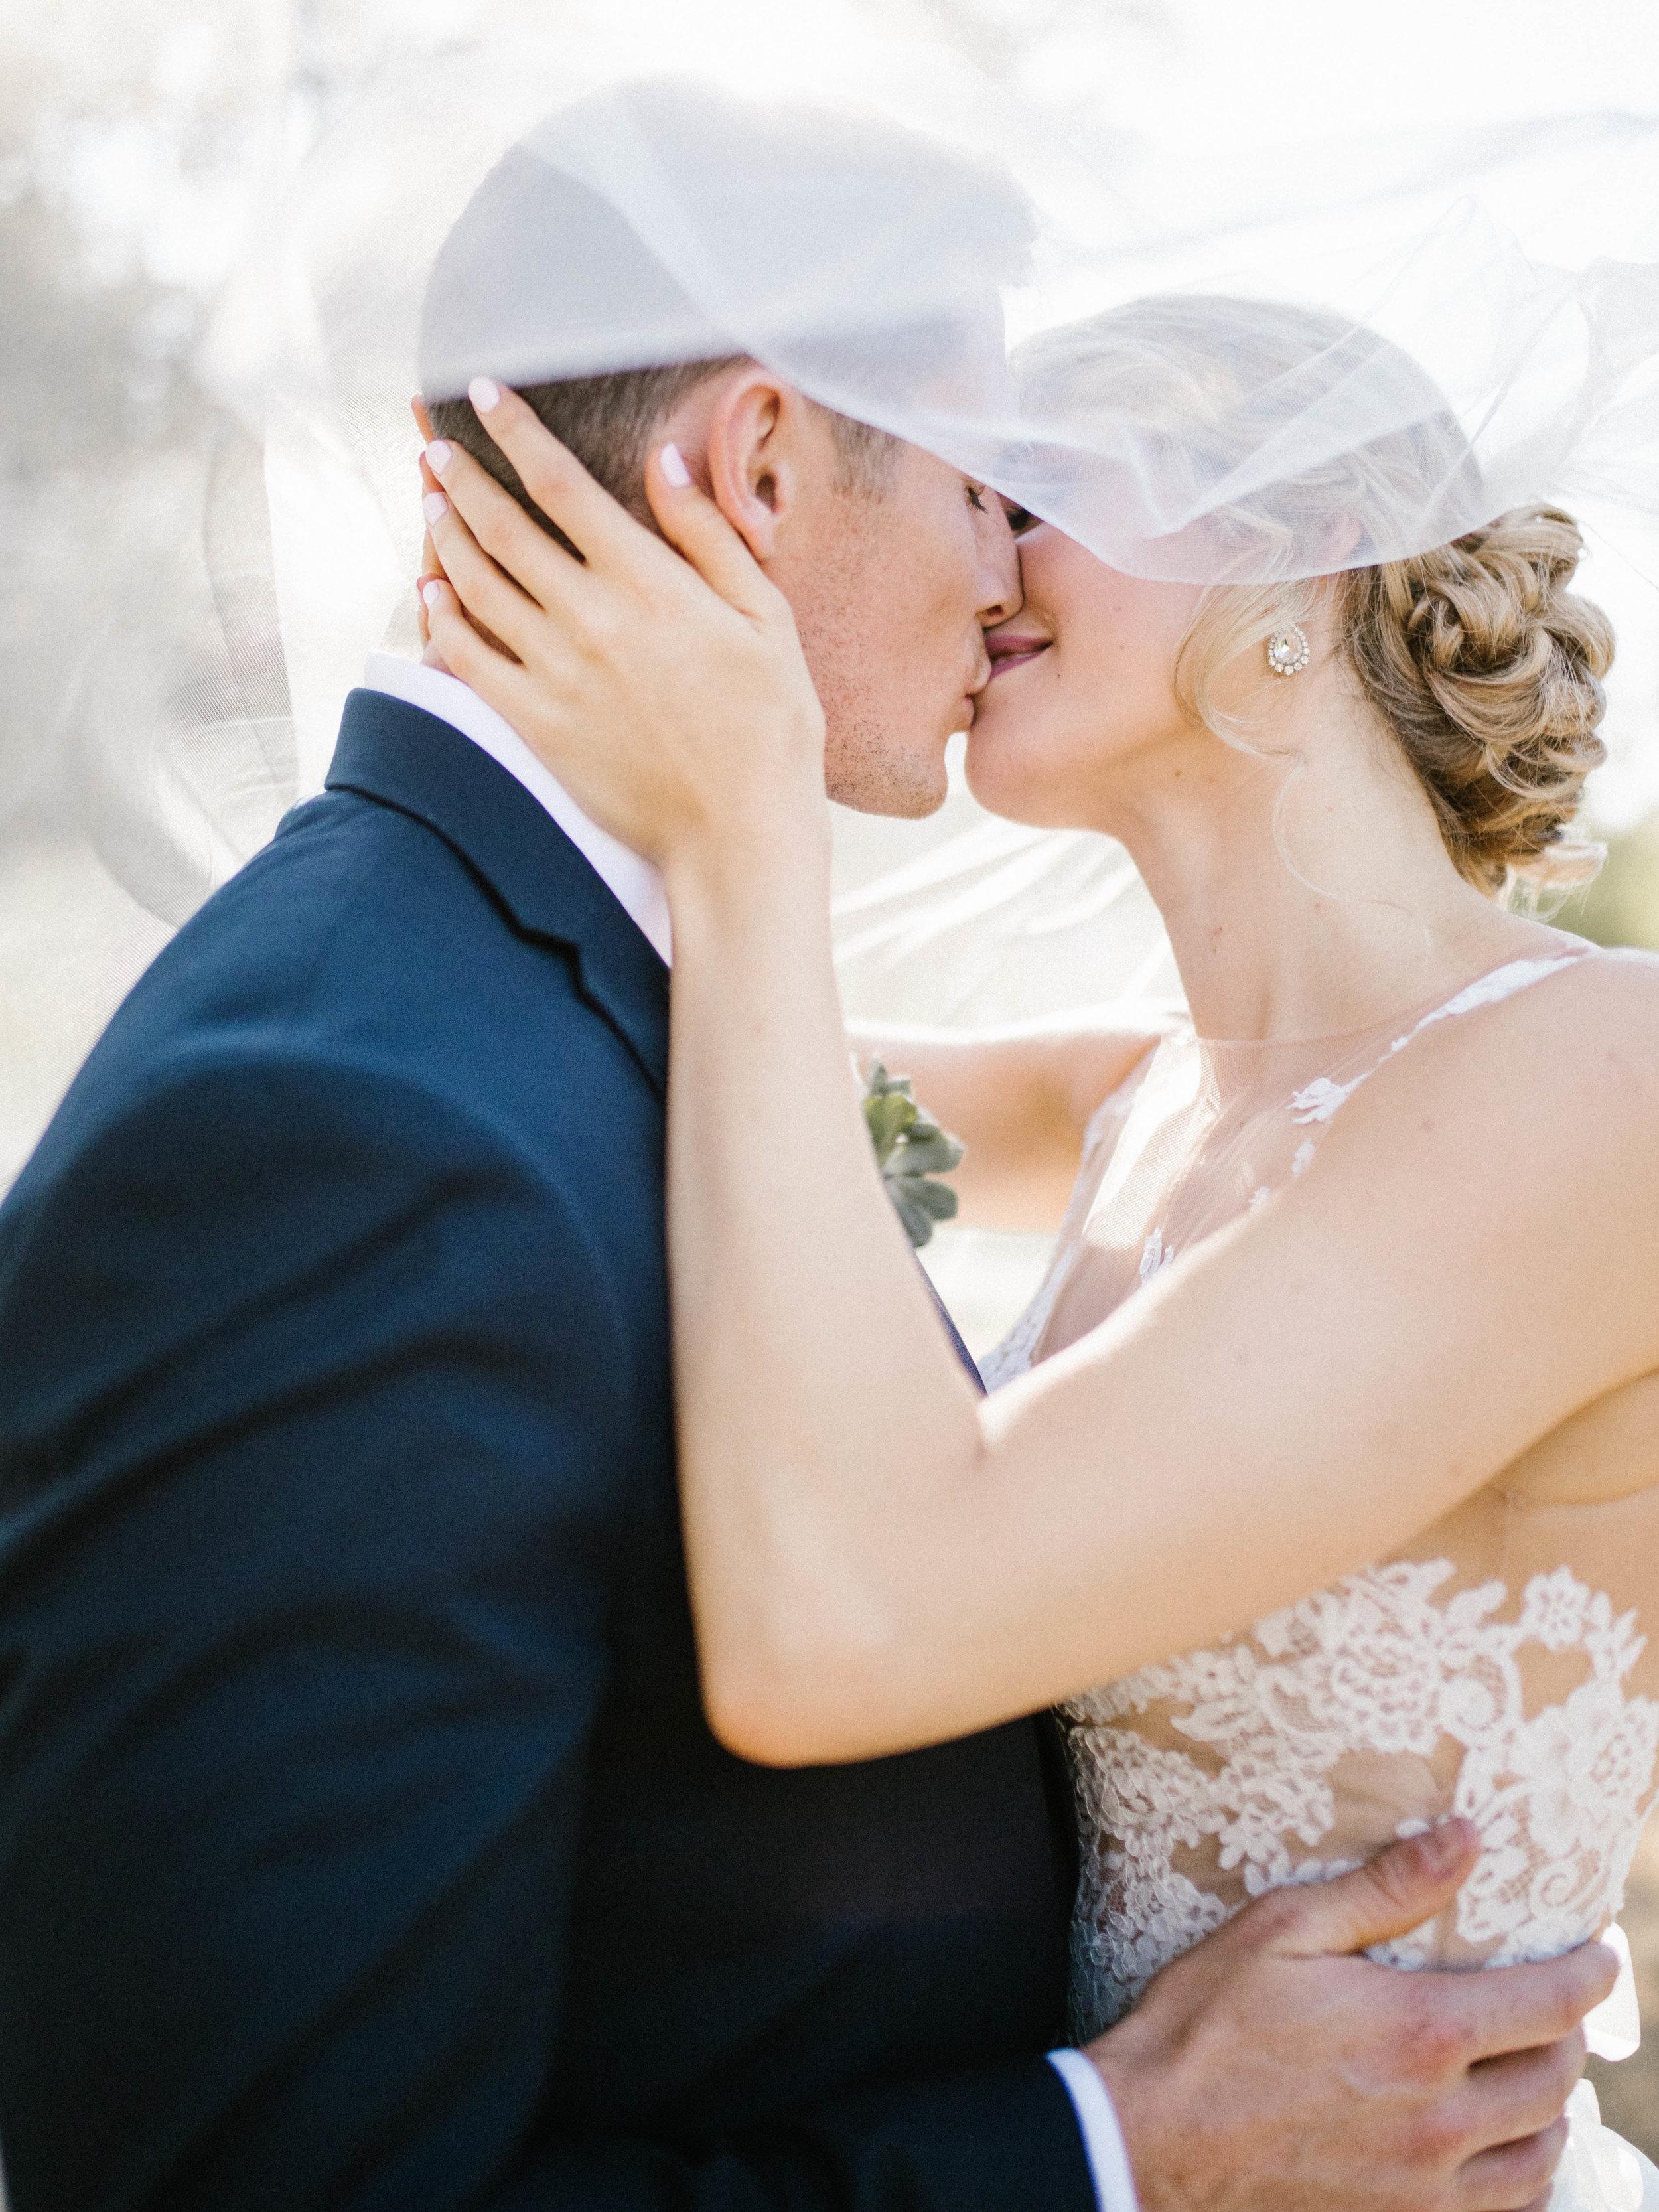 Weddings JESSICA & GREGORY - CARMEL, CALIFORNIA WEDDING